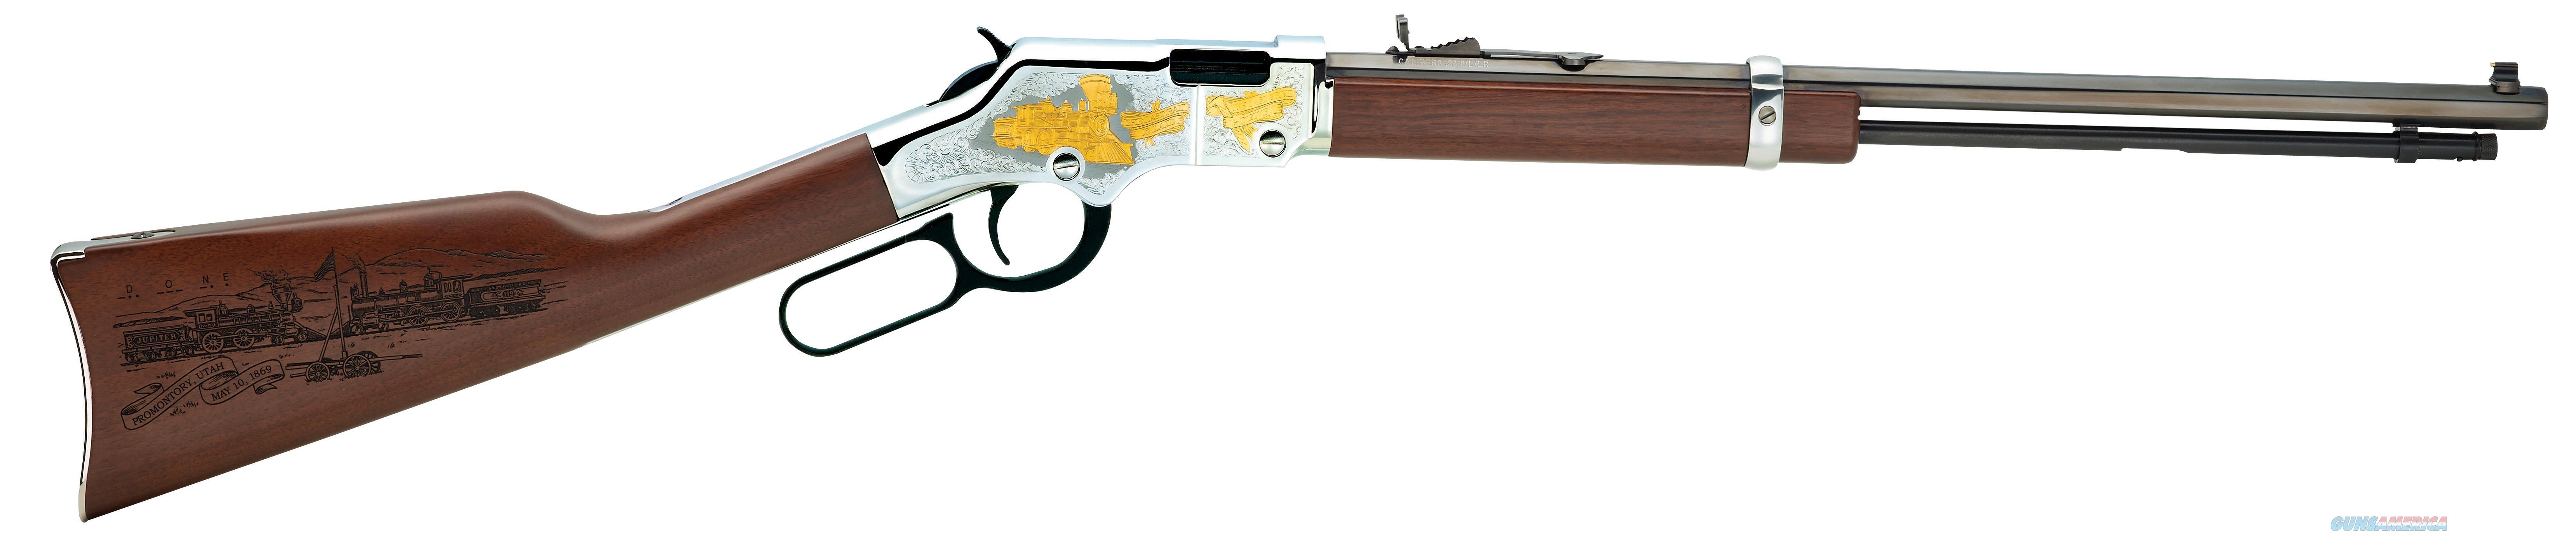 "Henry American Railroad .22S/L/Lr 20"" Octagon Engraved H004RR  Guns > Rifles > H Misc Rifles"